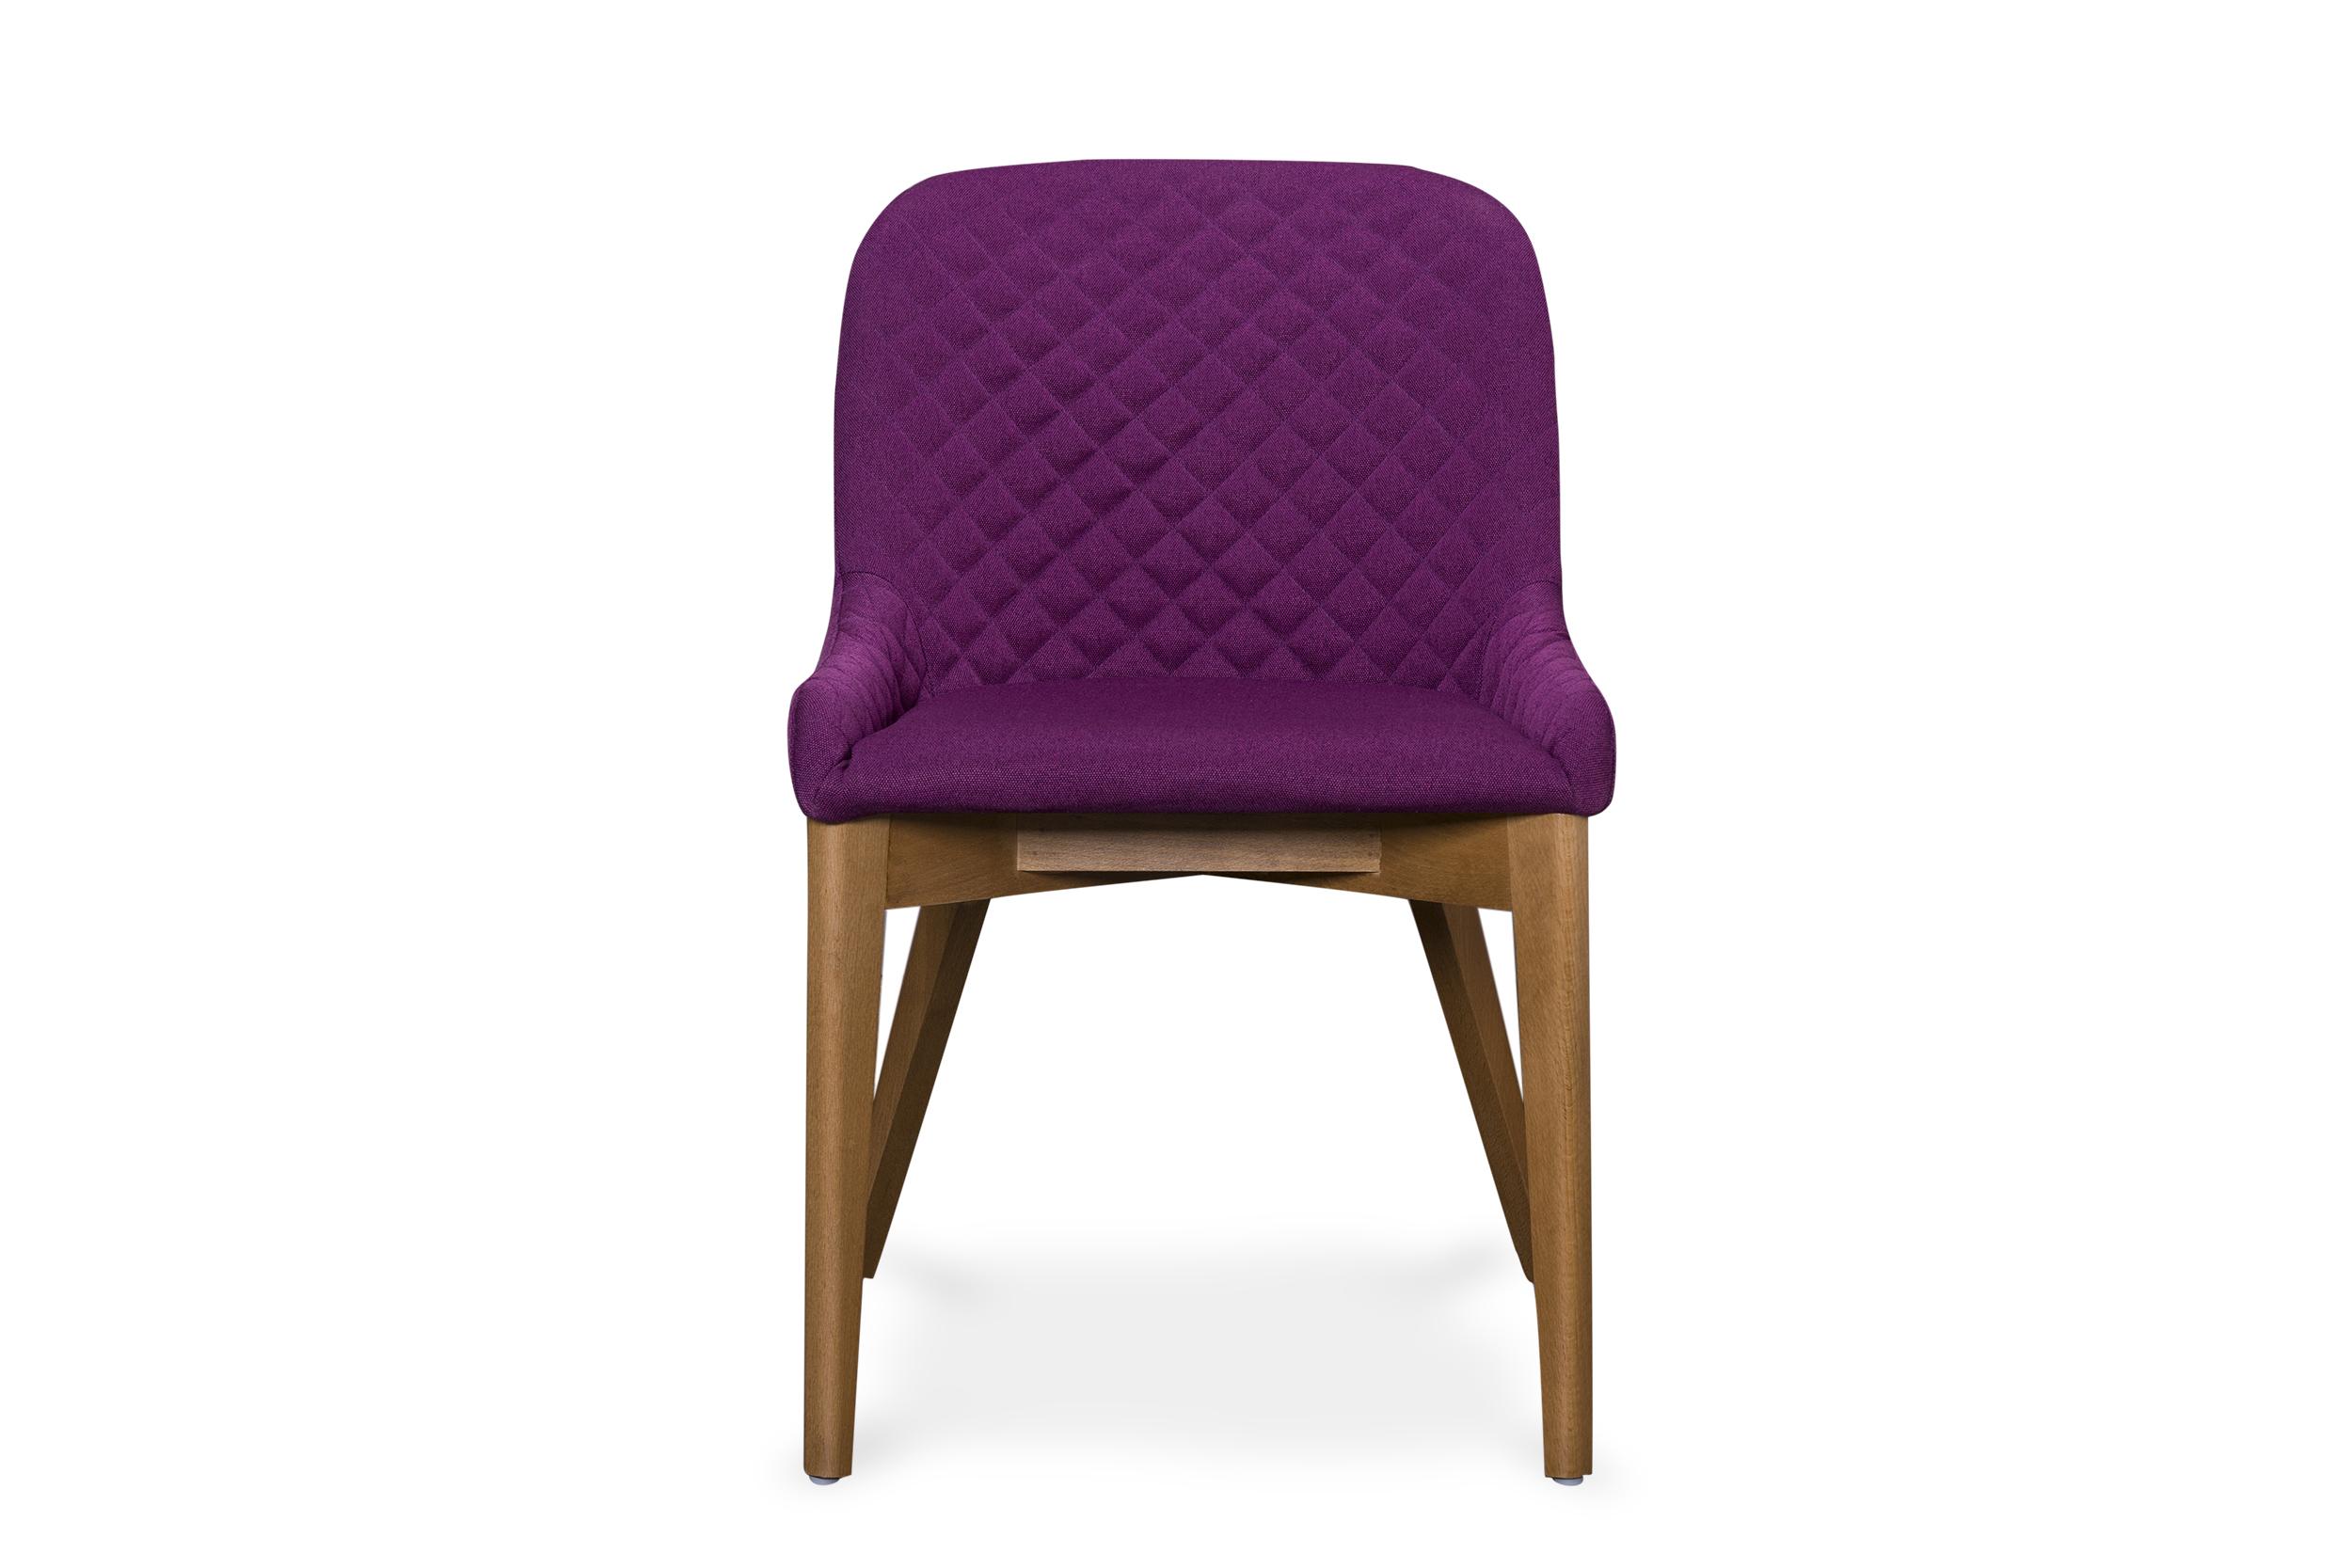 Стул MarcoОбеденные стулья<br><br><br>Material: Текстиль<br>Width см: 52<br>Depth см: 62<br>Height см: 80